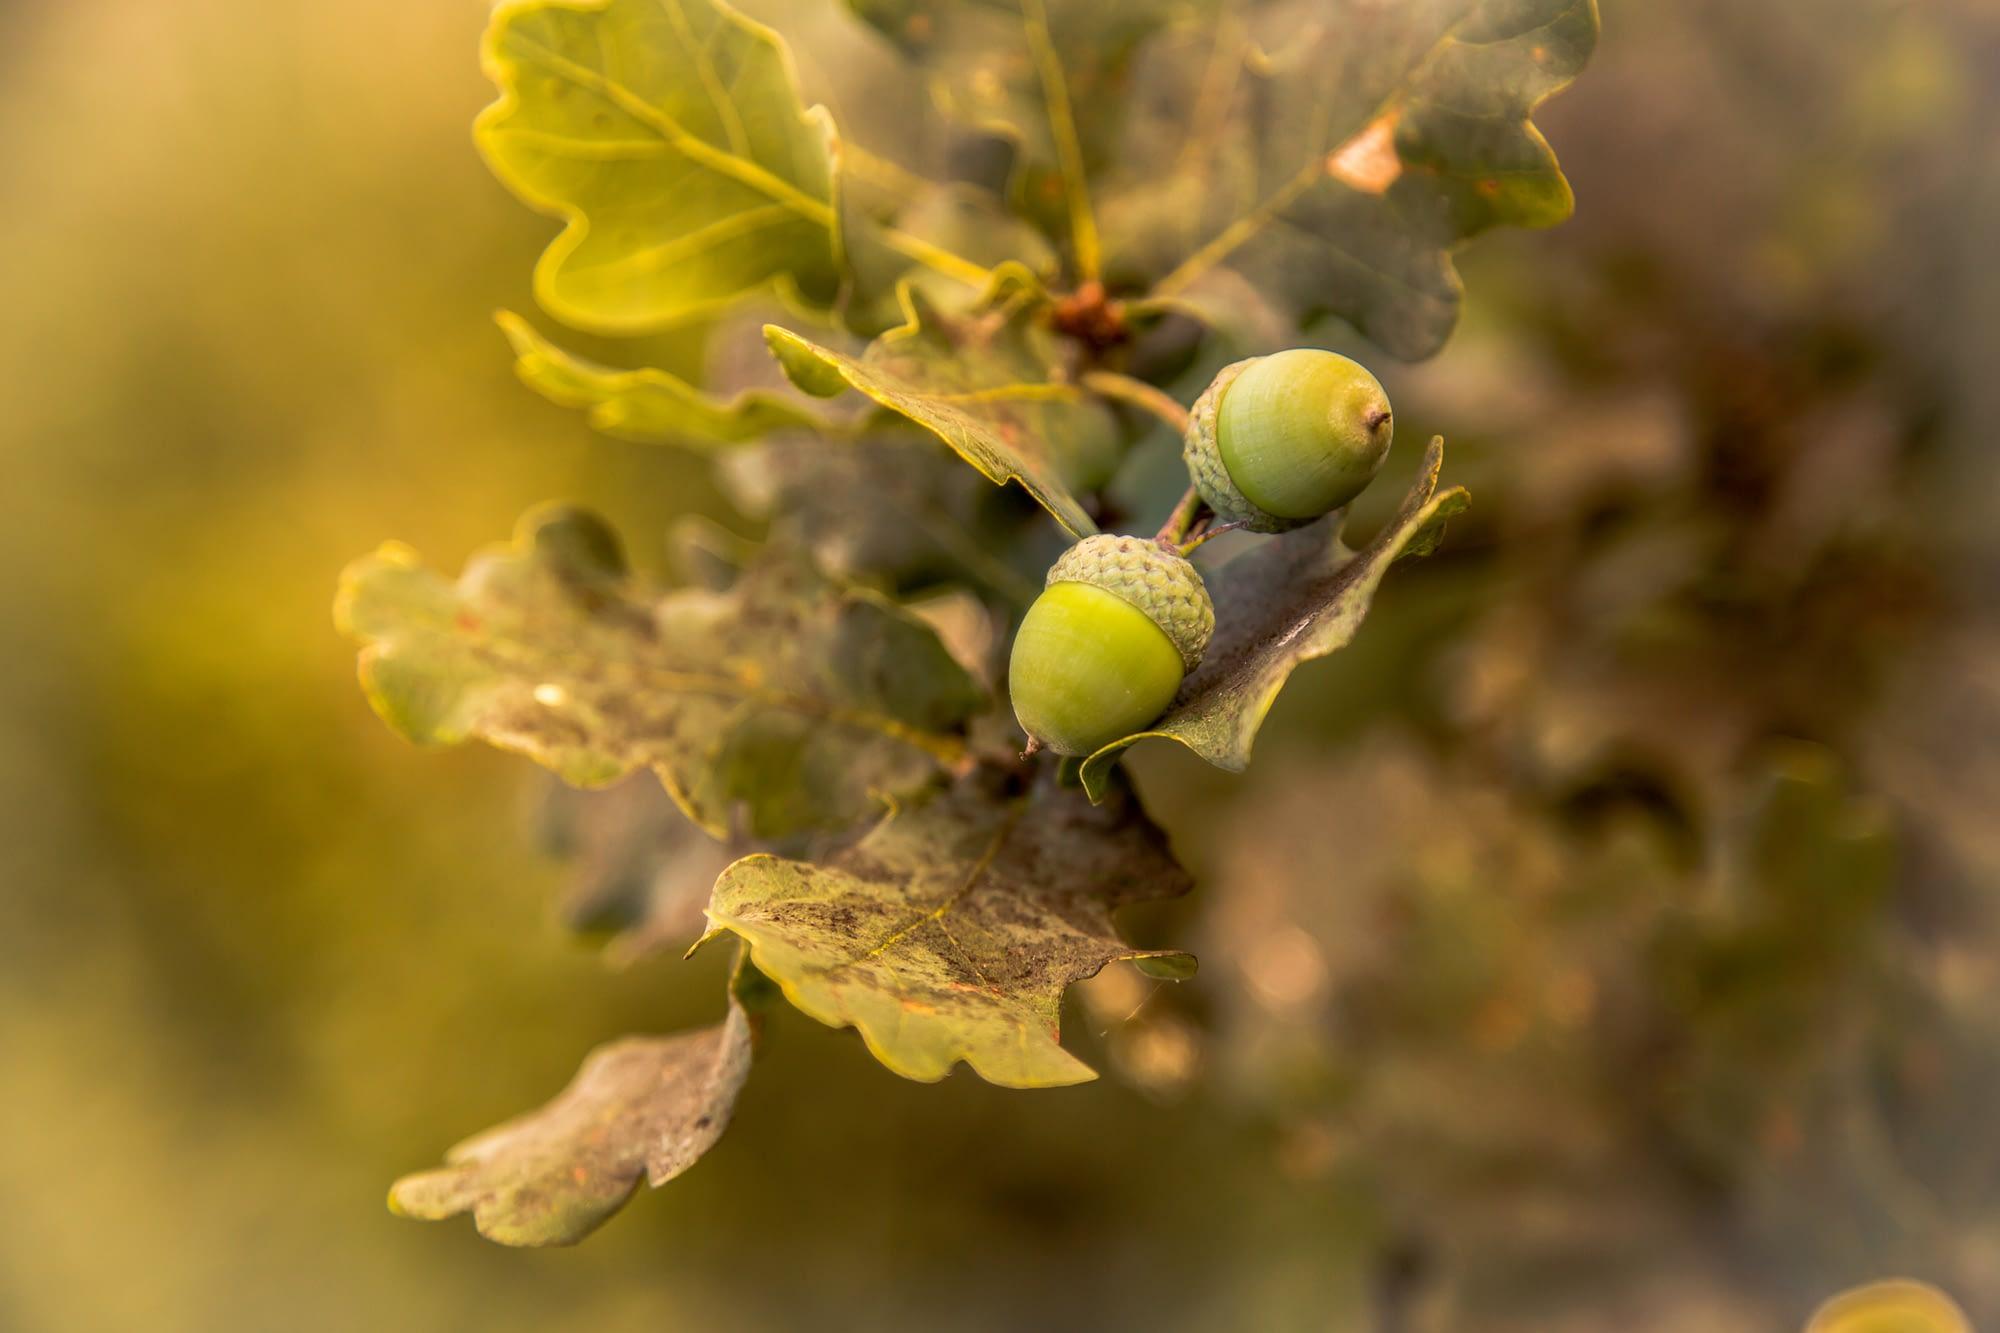 Fruit de chêne gland par Stéphane Thirion photographe